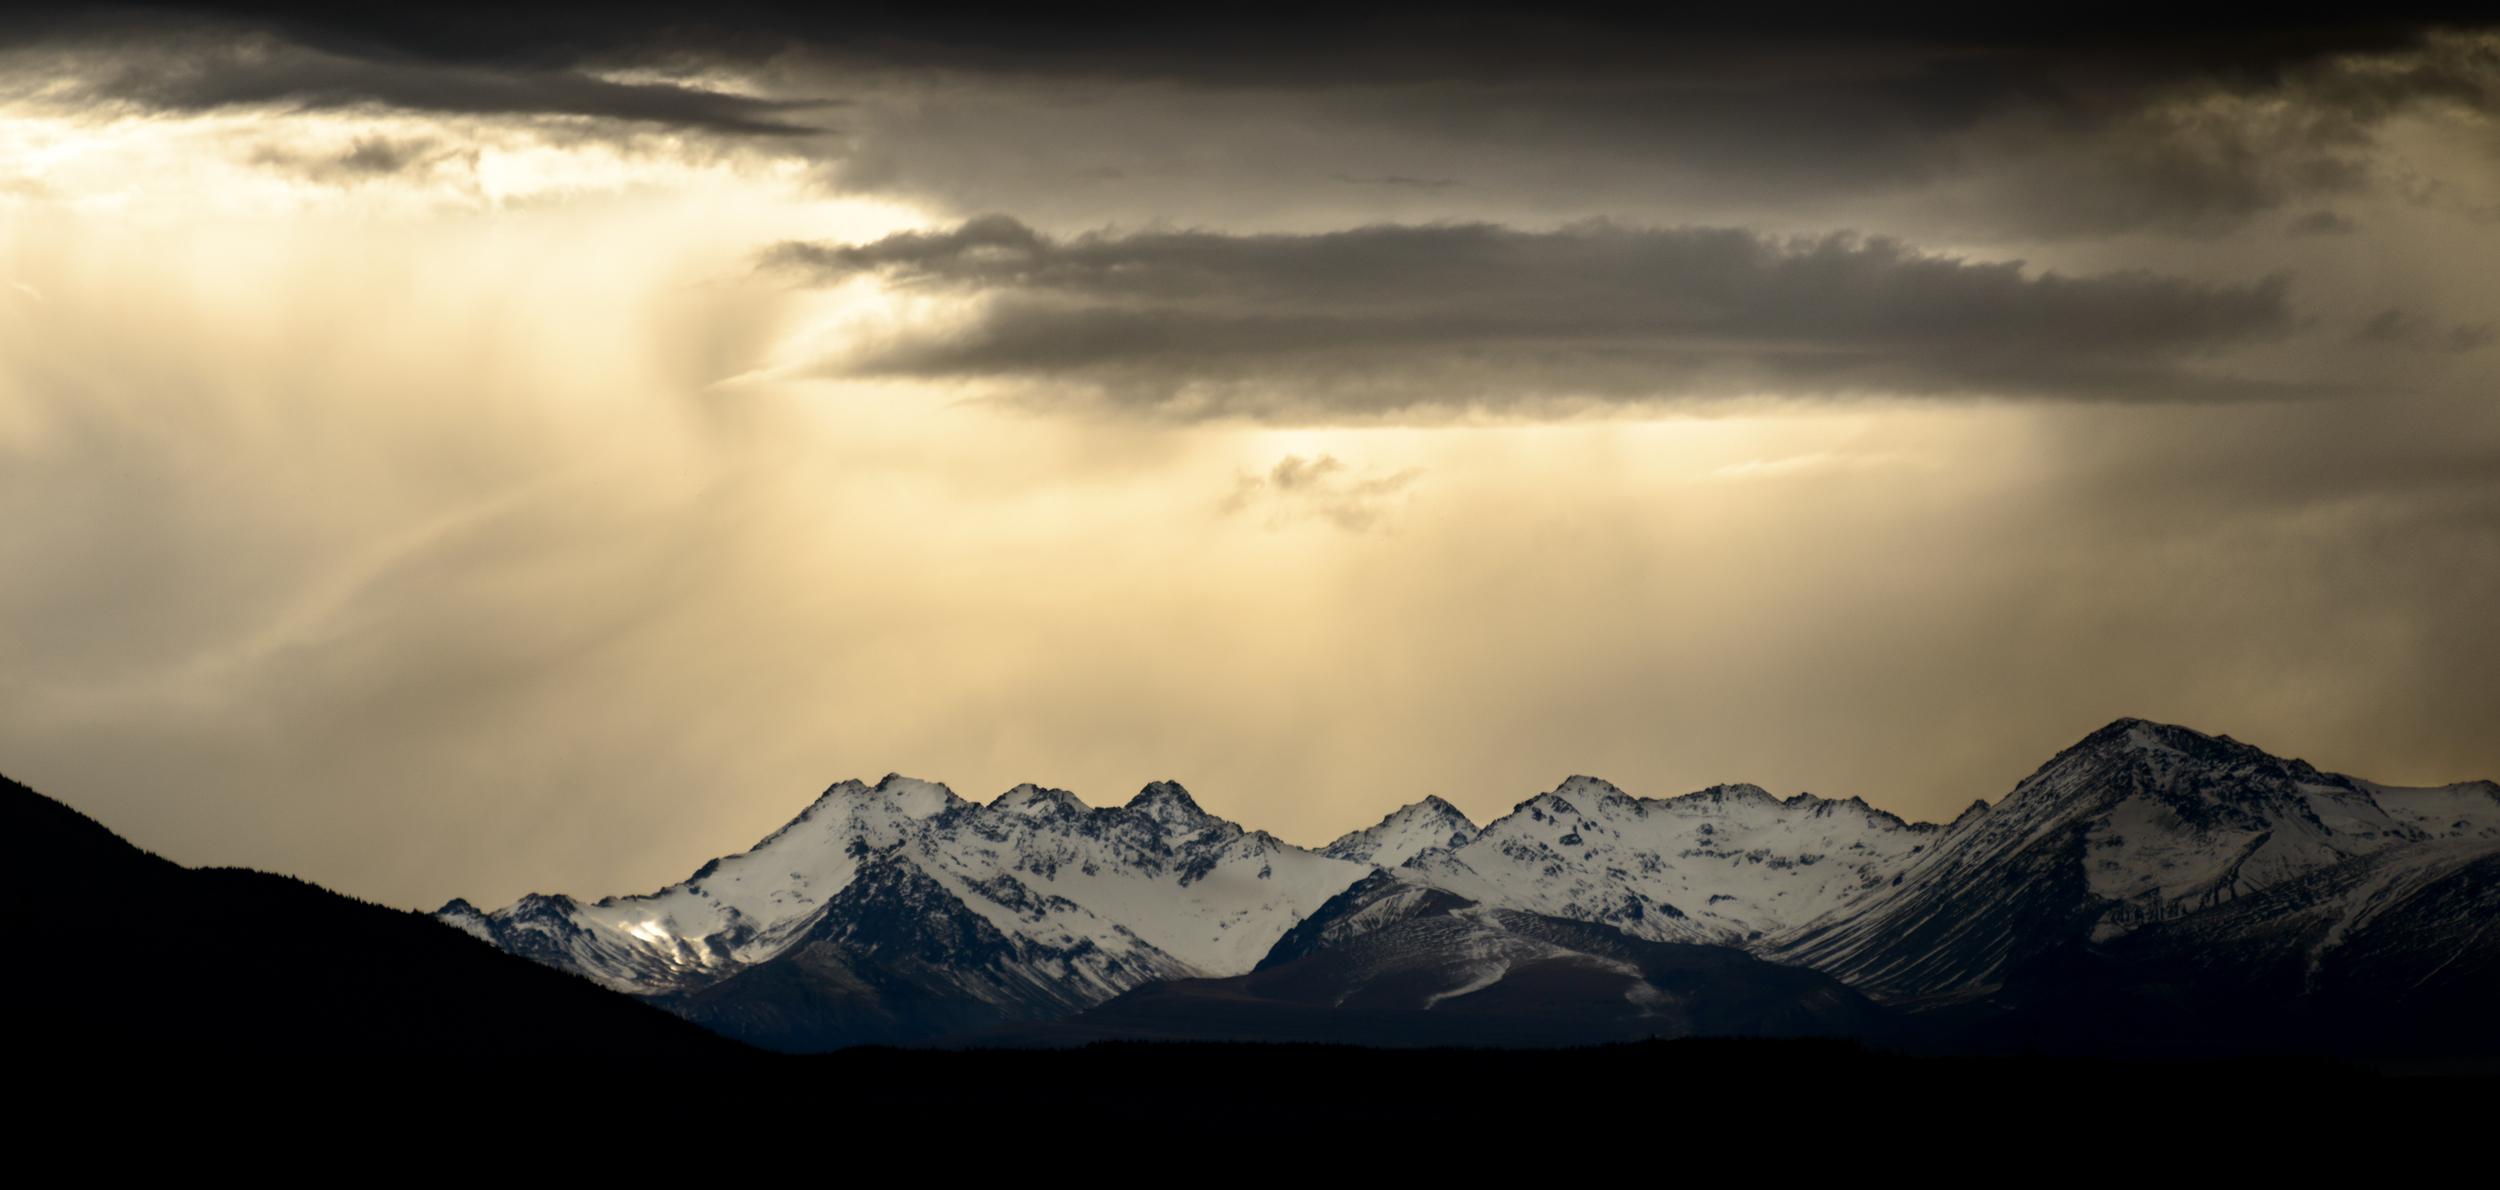 """Black Hills Storm""  Mackenzie Basin, South Island, New Zealand  D800, ISO100, f5.6, 1/1250sec, 250mm"